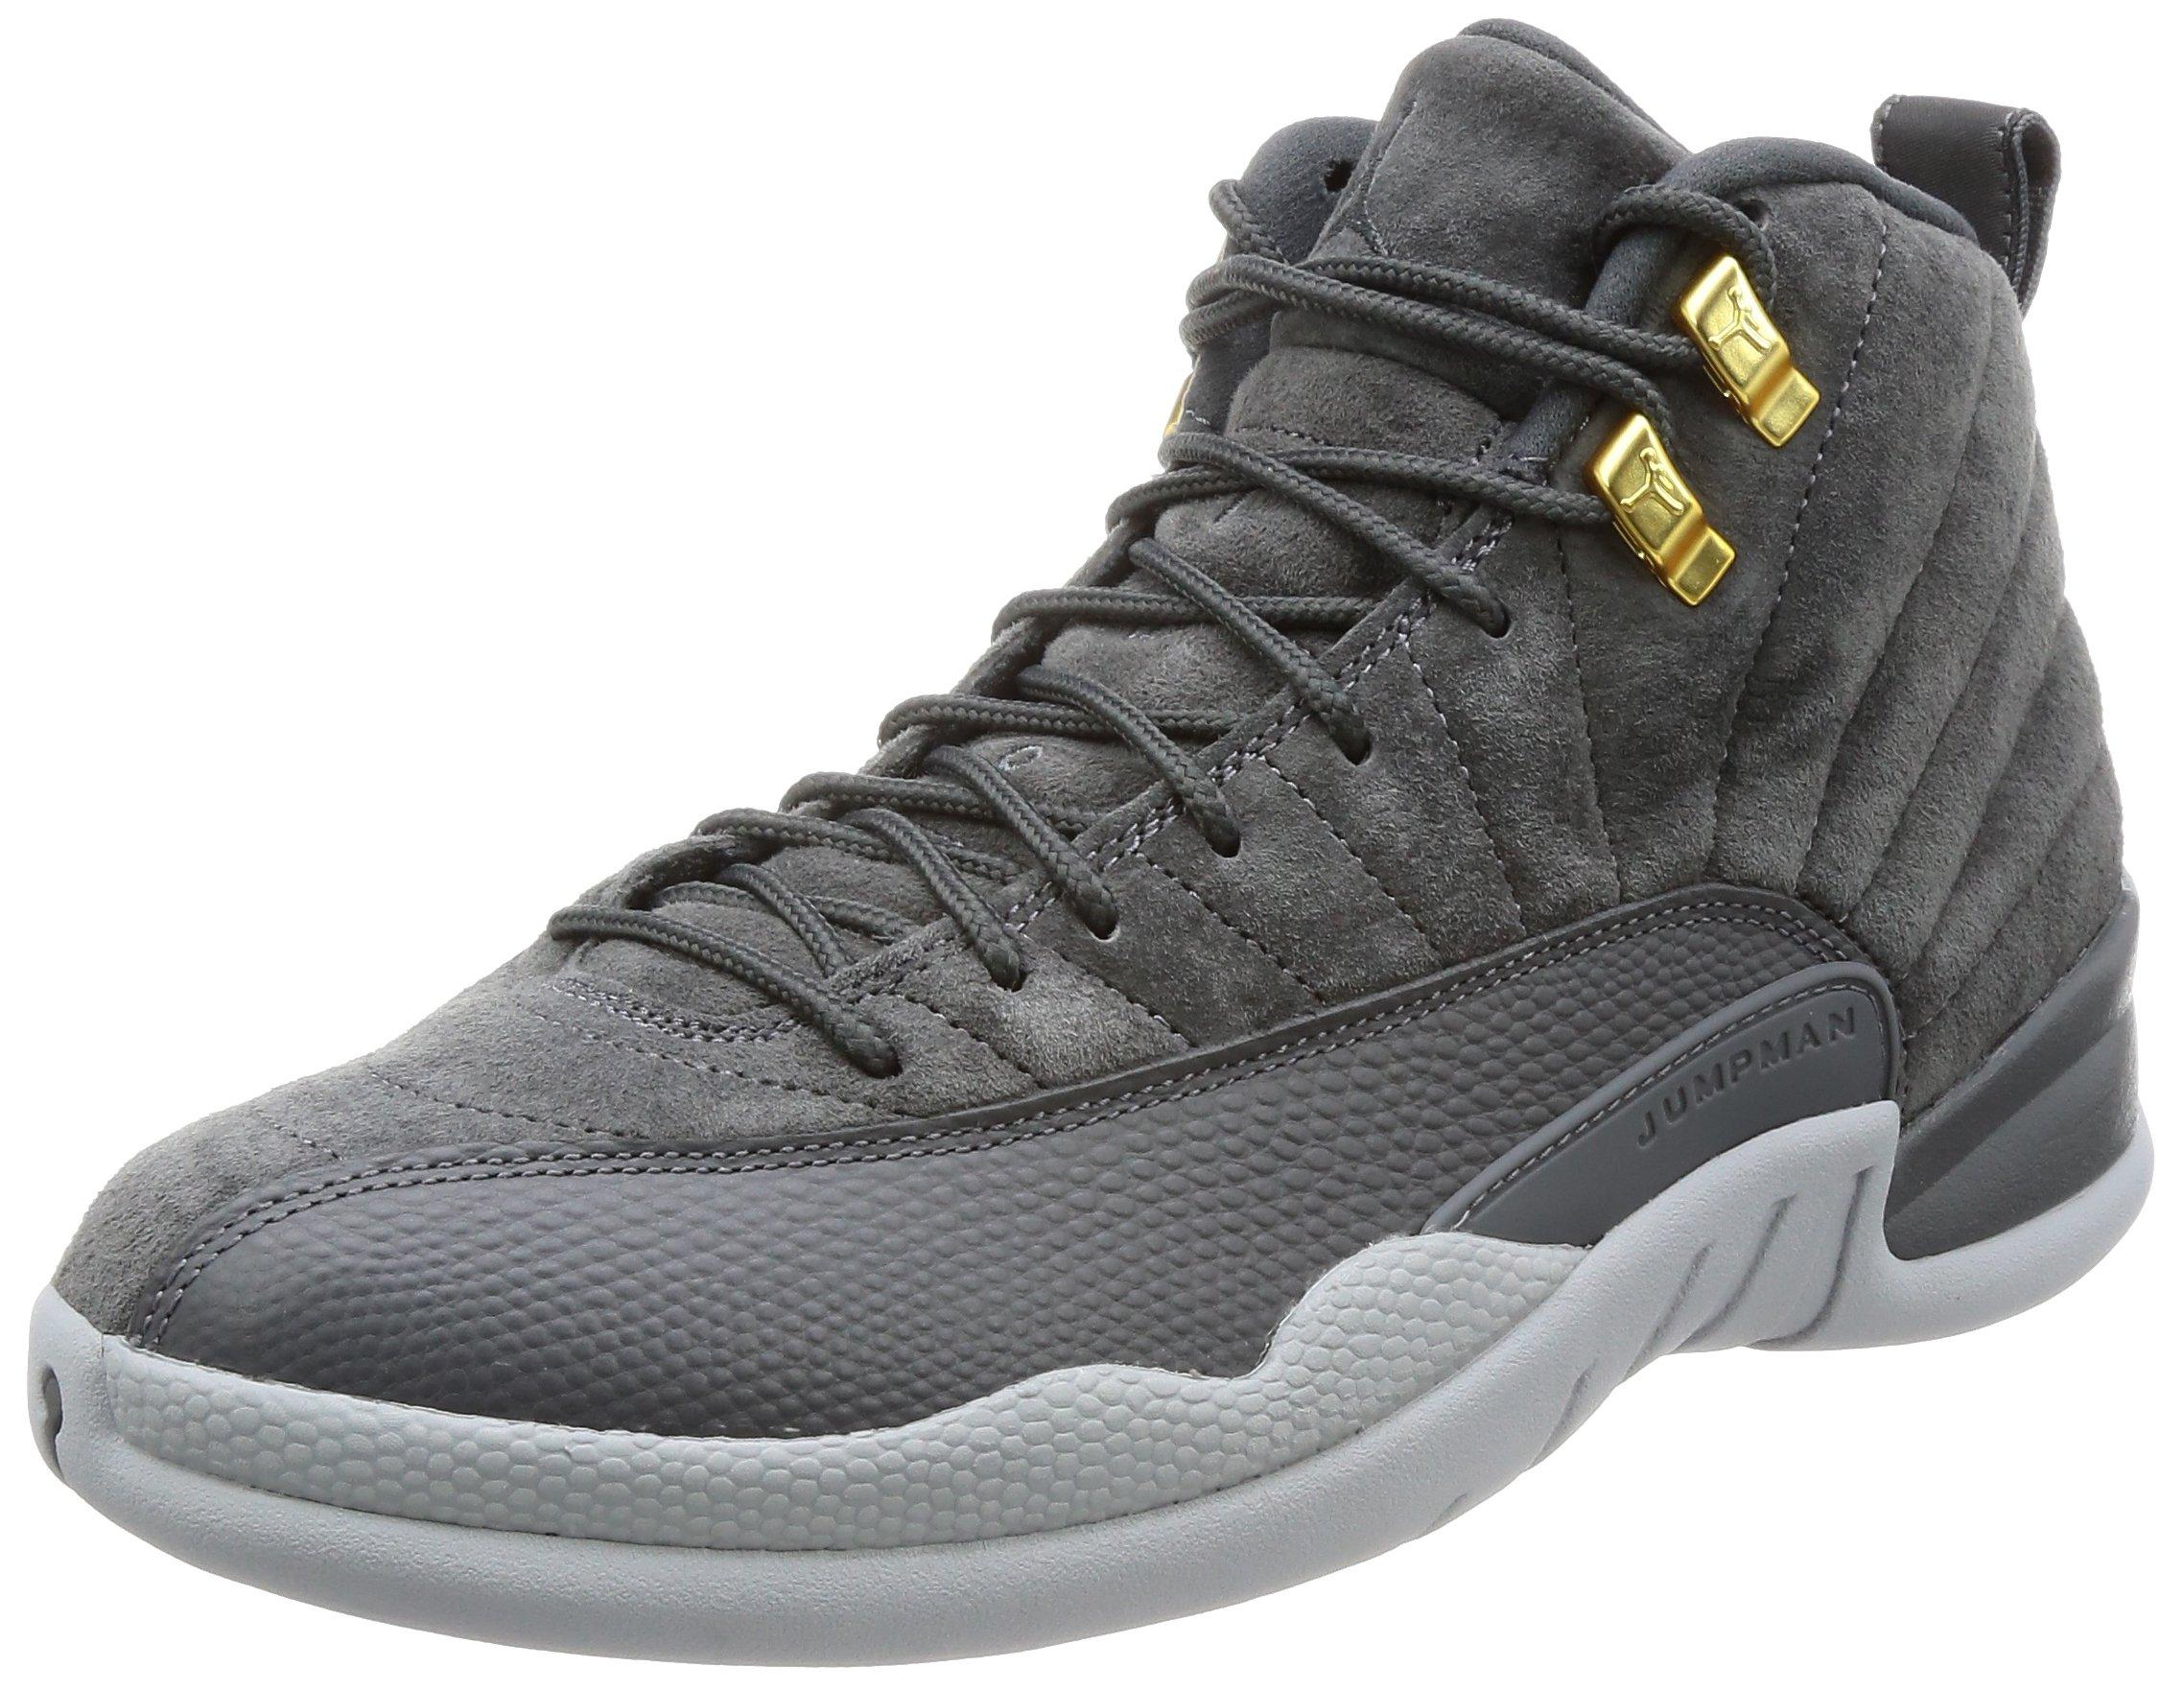 Jordan Men's Air 12 Retro, Dark Grey/Dark Grey-Wolf Grey, 7.5 M US by Jordan